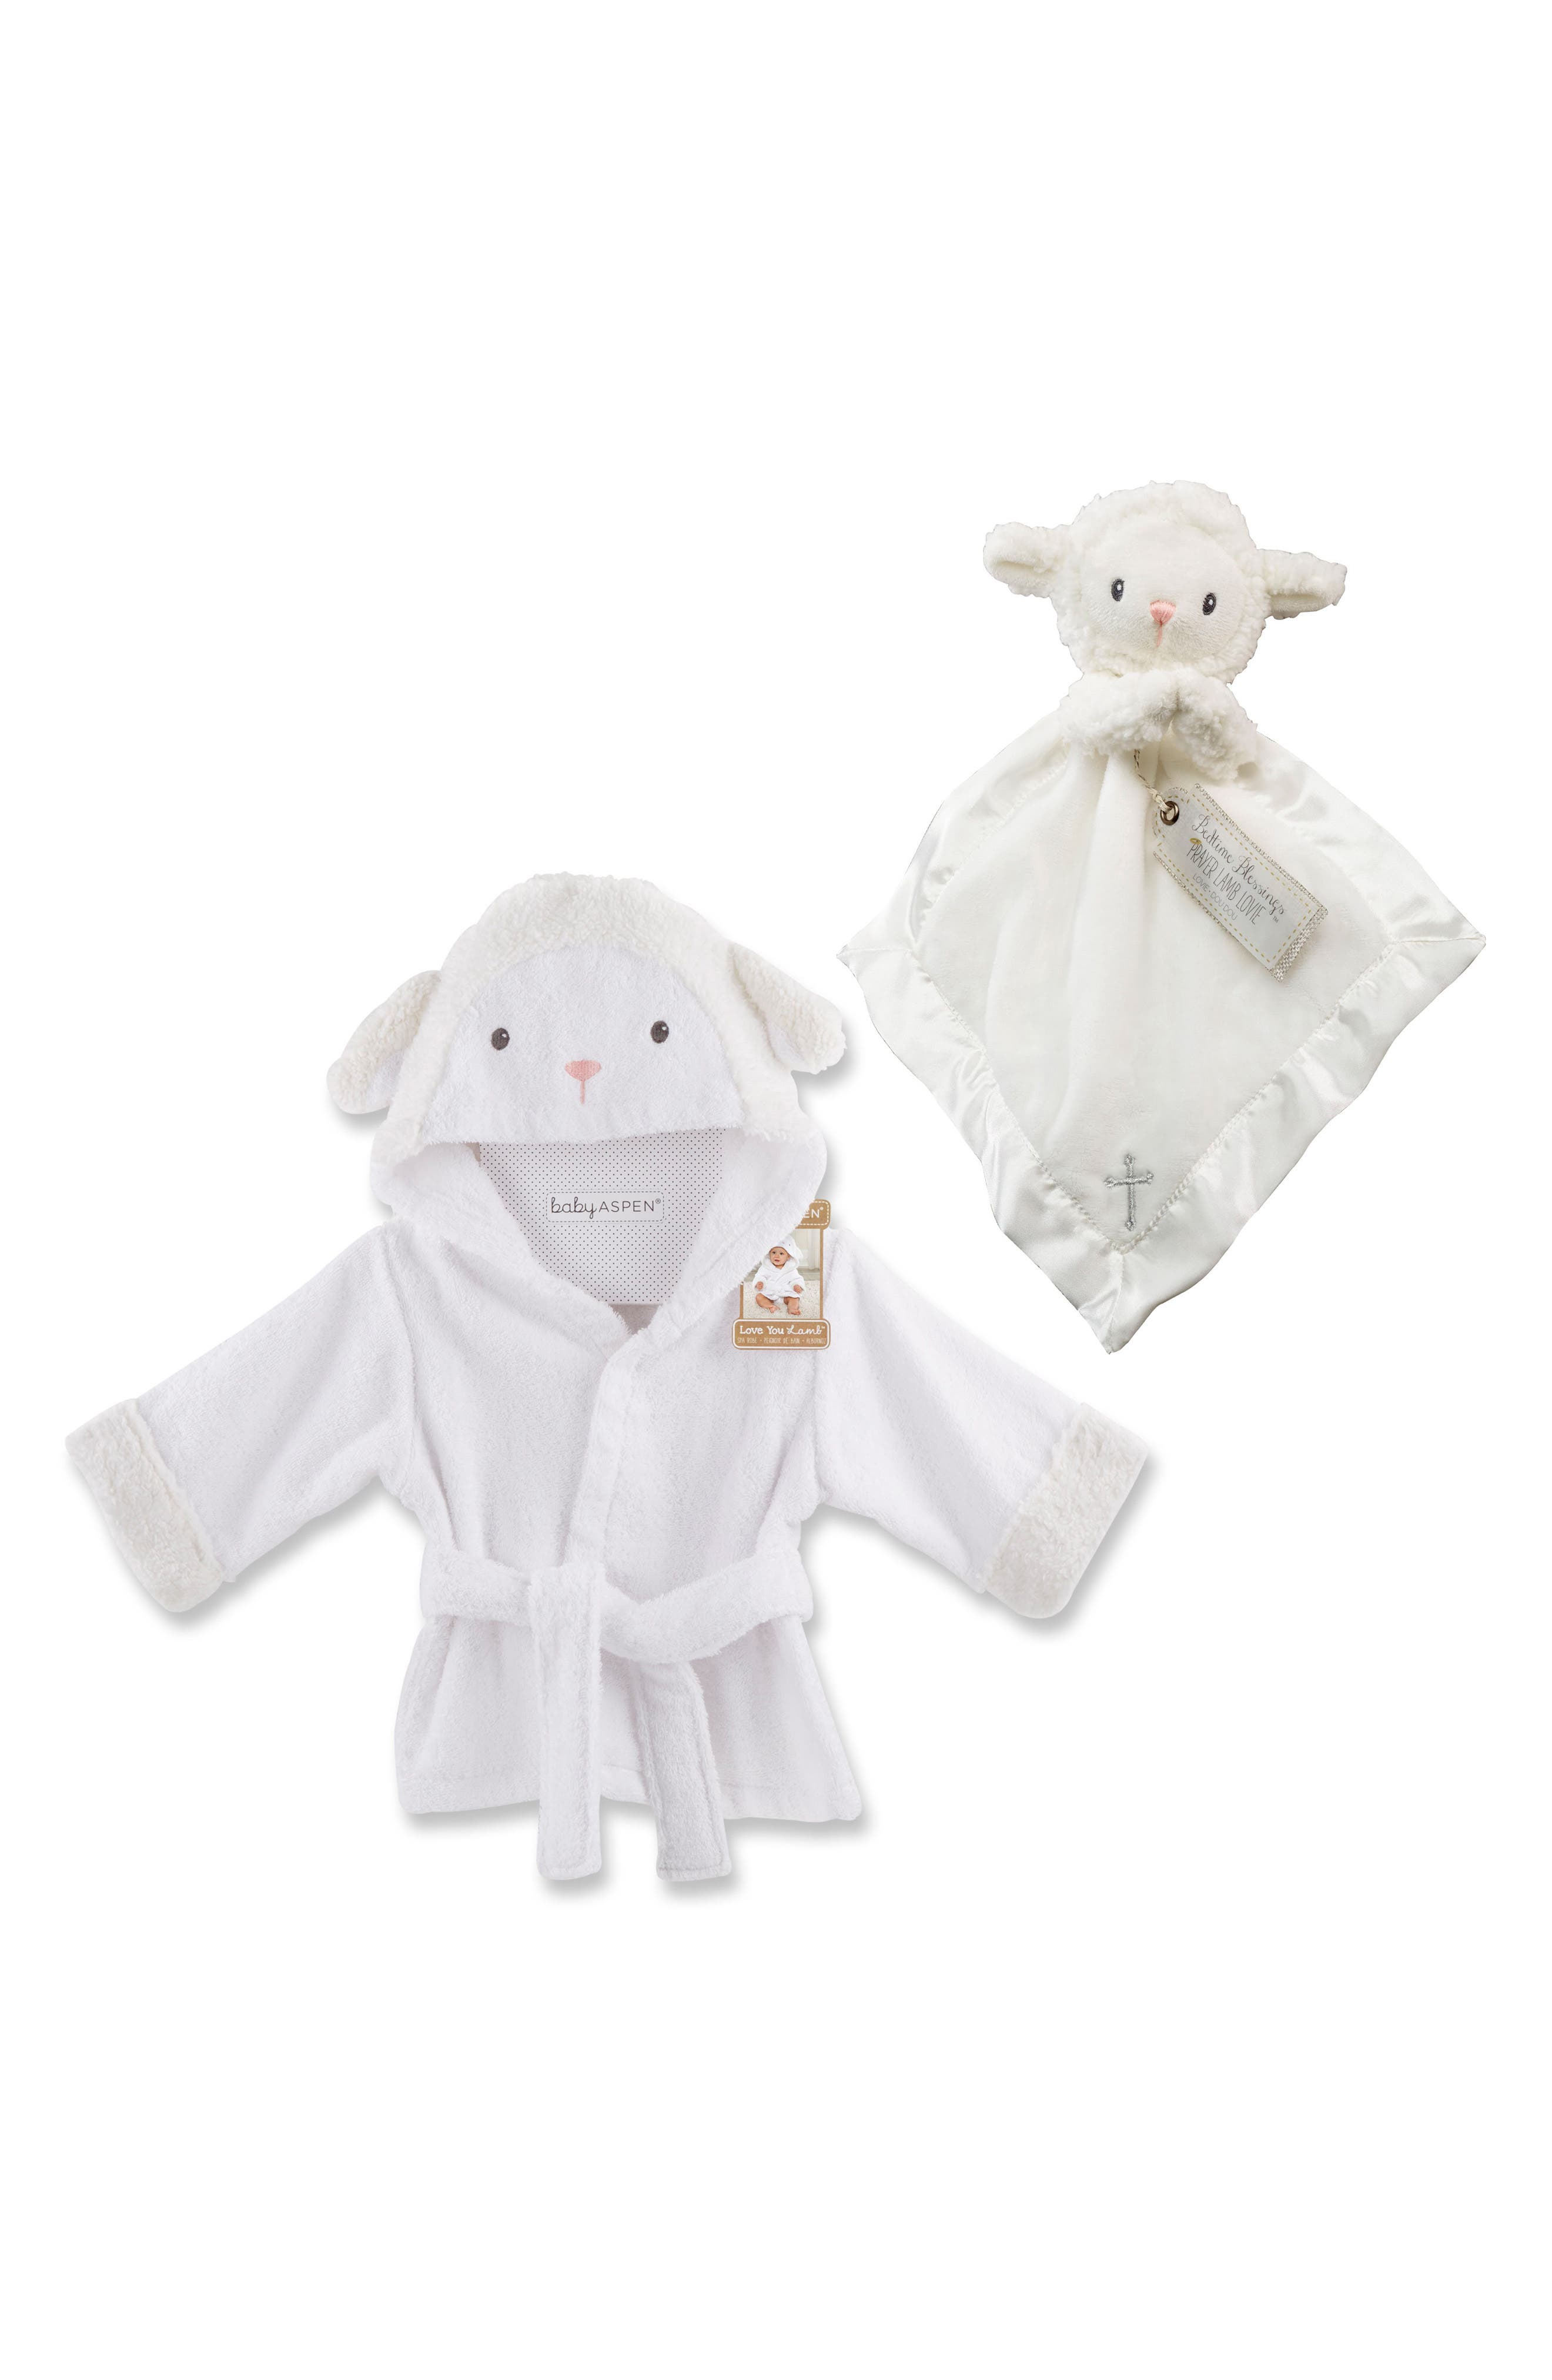 Lamb Hooded Robe & Blanket,                             Main thumbnail 1, color,                             WHITE